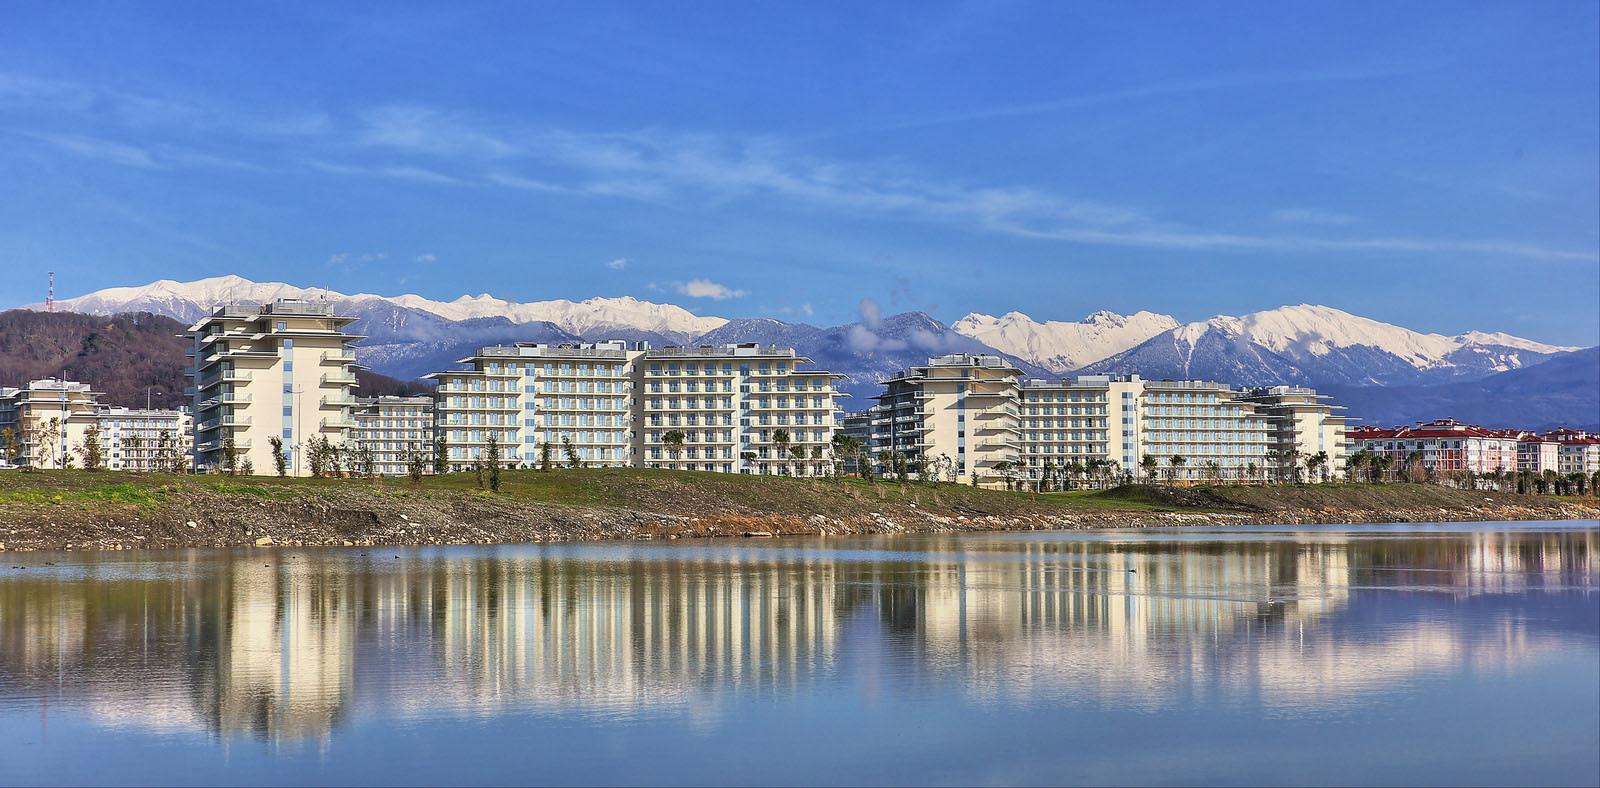 Sochi 2014 Olympics Coastal Village